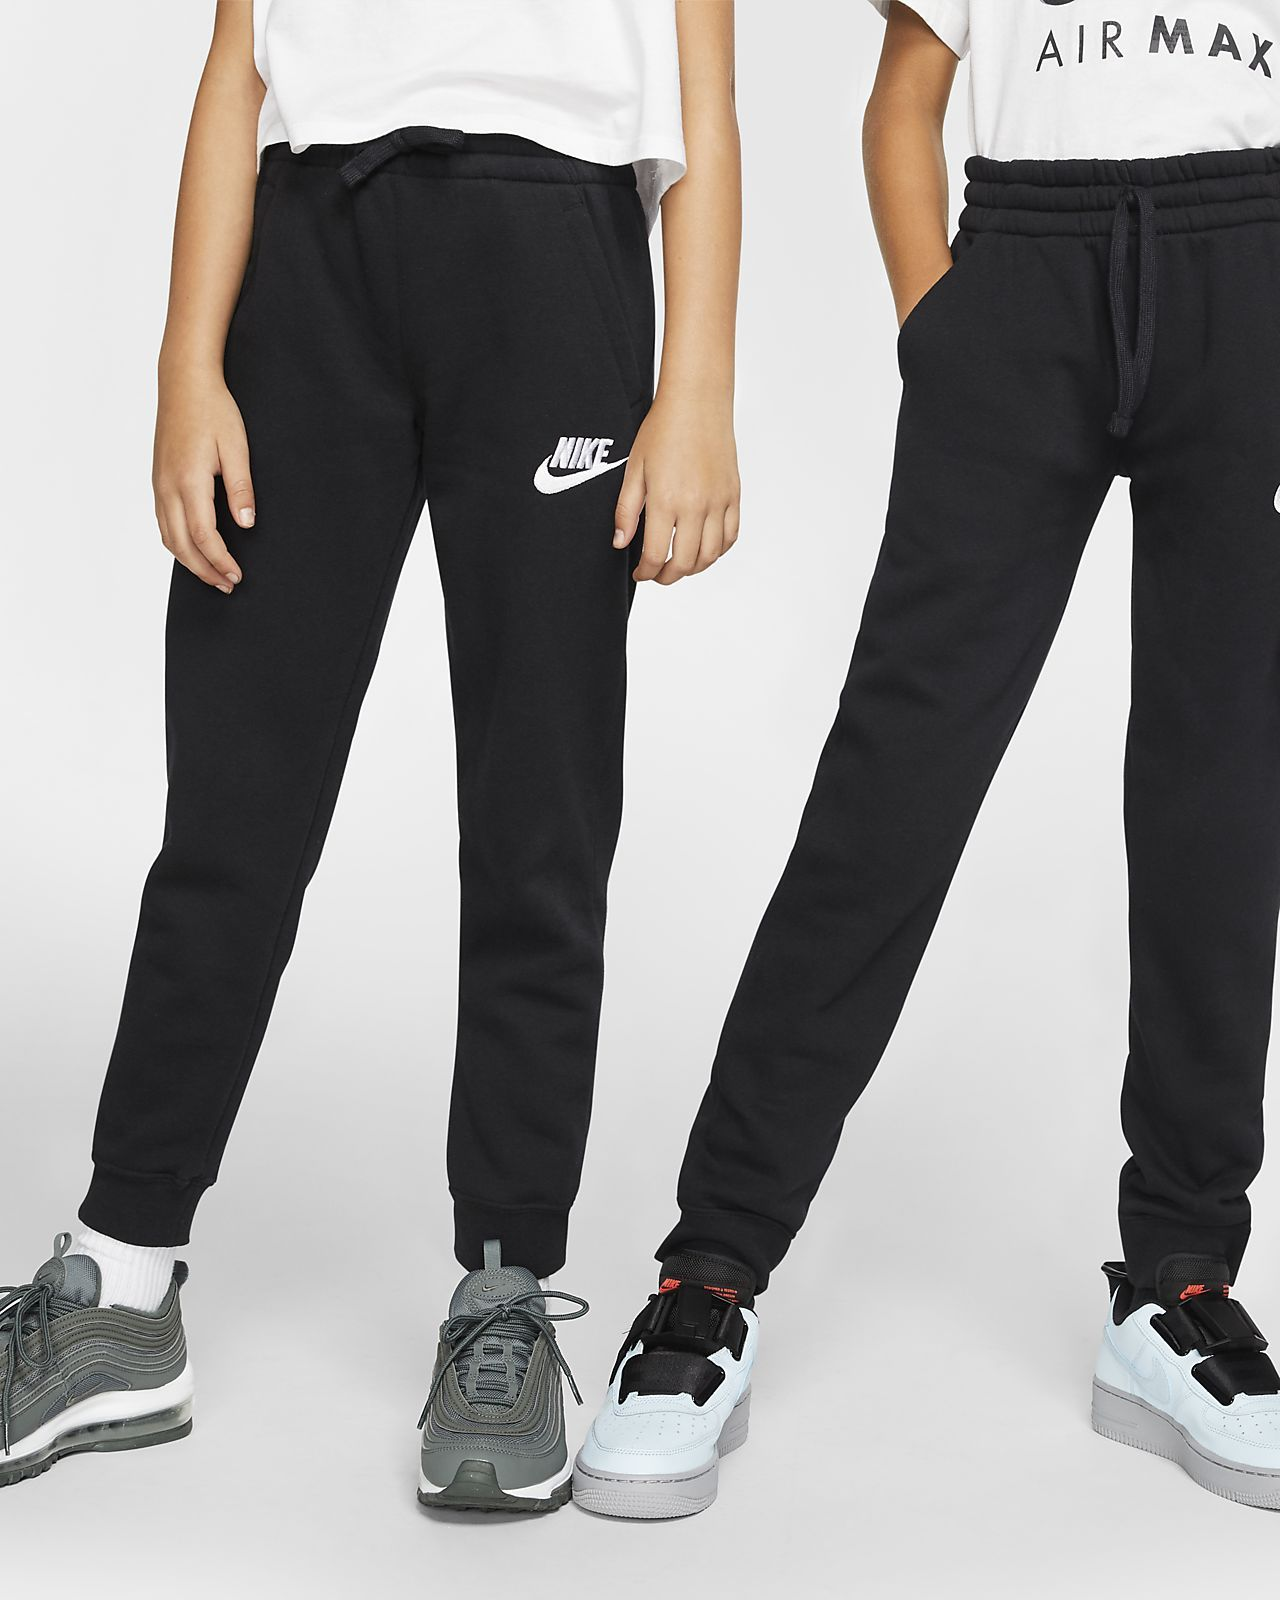 seguridad Conquistar Explosivos  Nike Sportswear Club Fleece Pantalón - Niño/a. Nike ES   Nike sportswear,  Sportswear, Kids pants